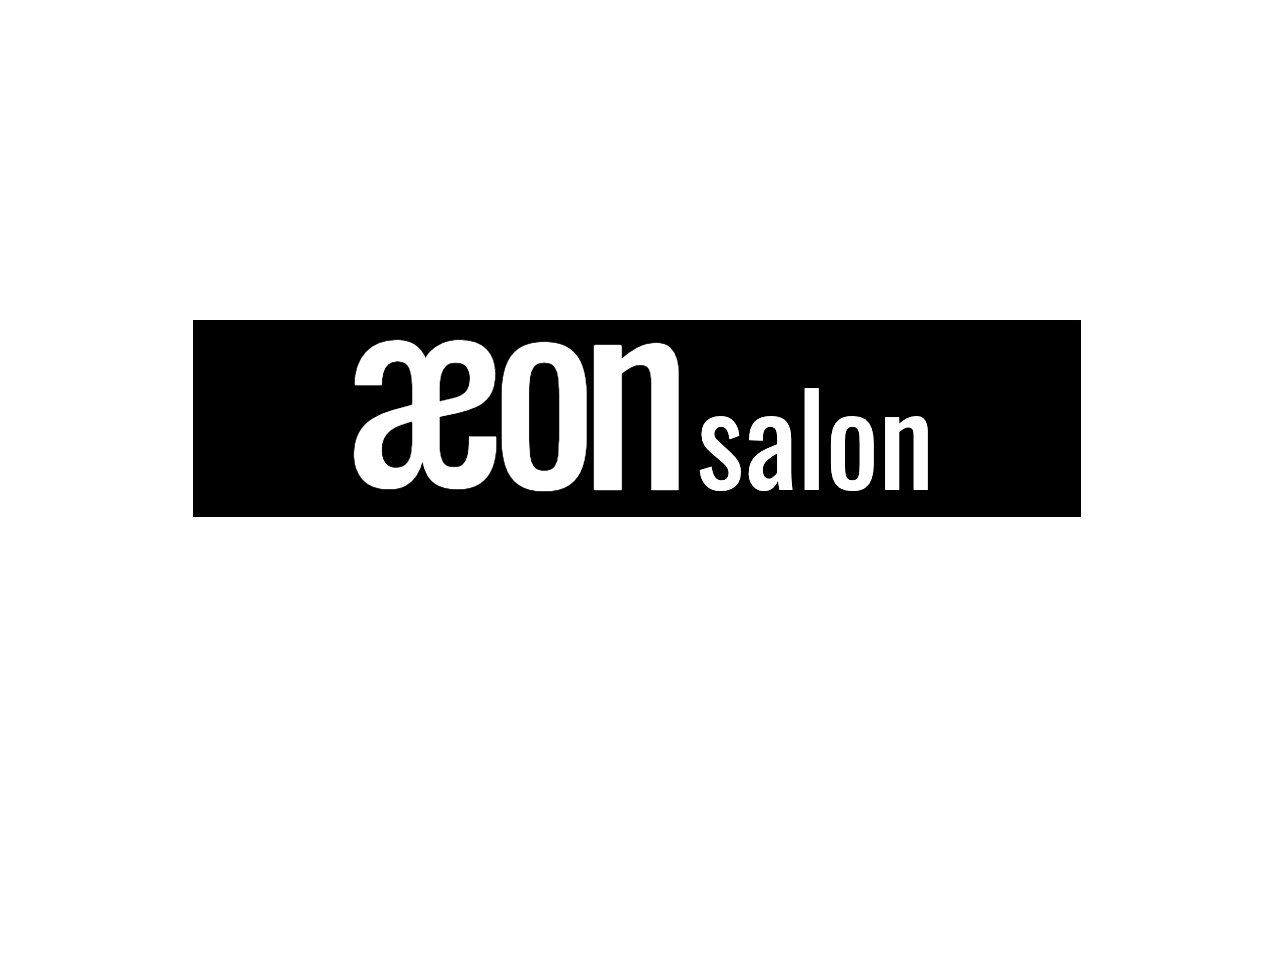 æon salon